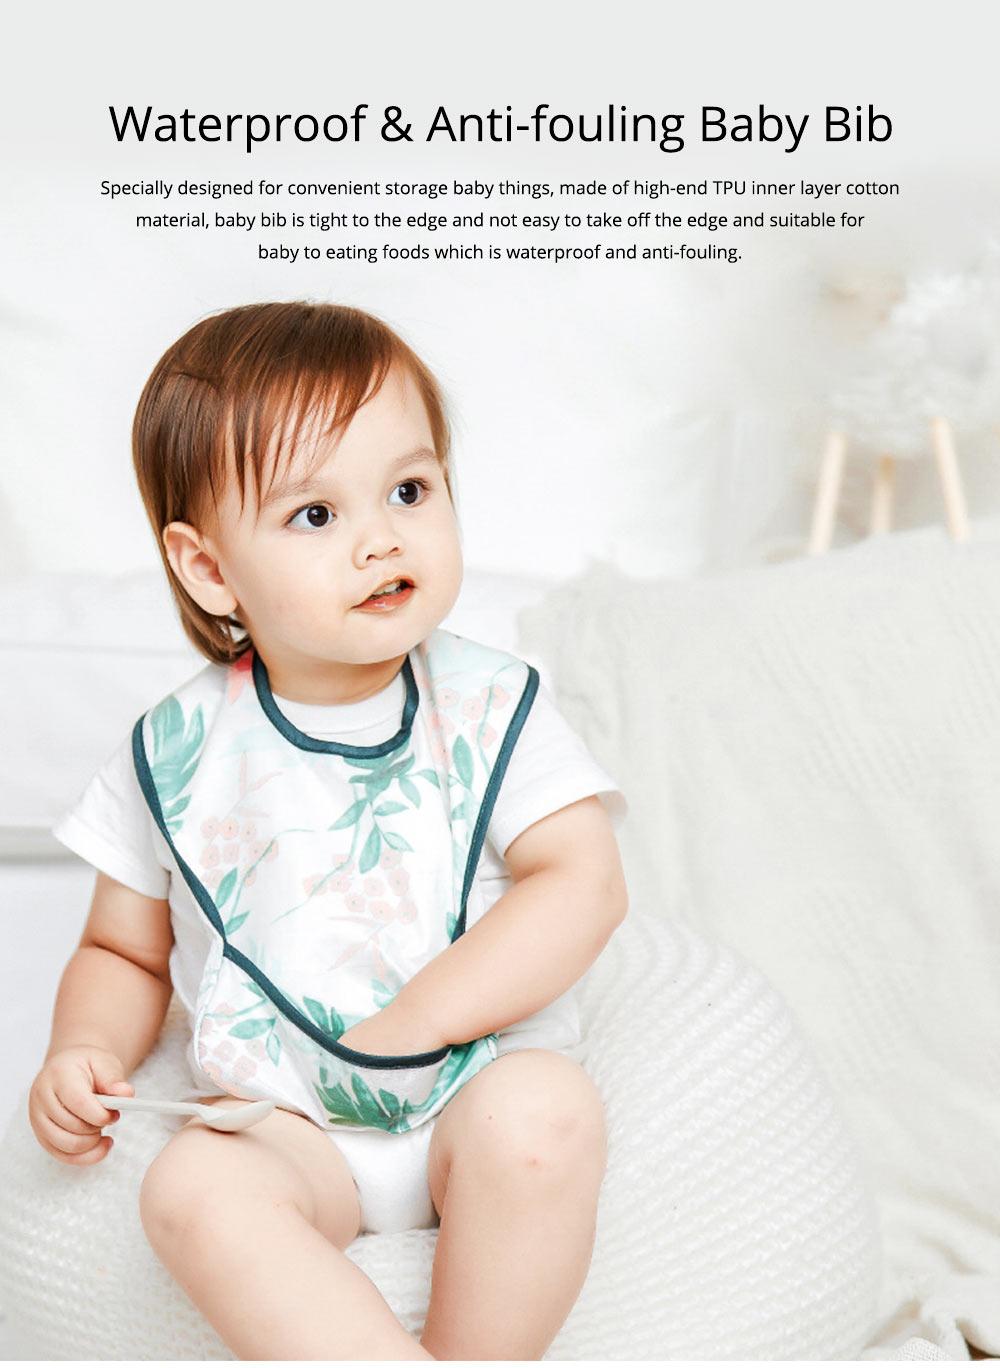 Waterproof & Anti-fouling Baby Bib with Large Capacity Rice Pocket & Velcro Design Baby Bib 0